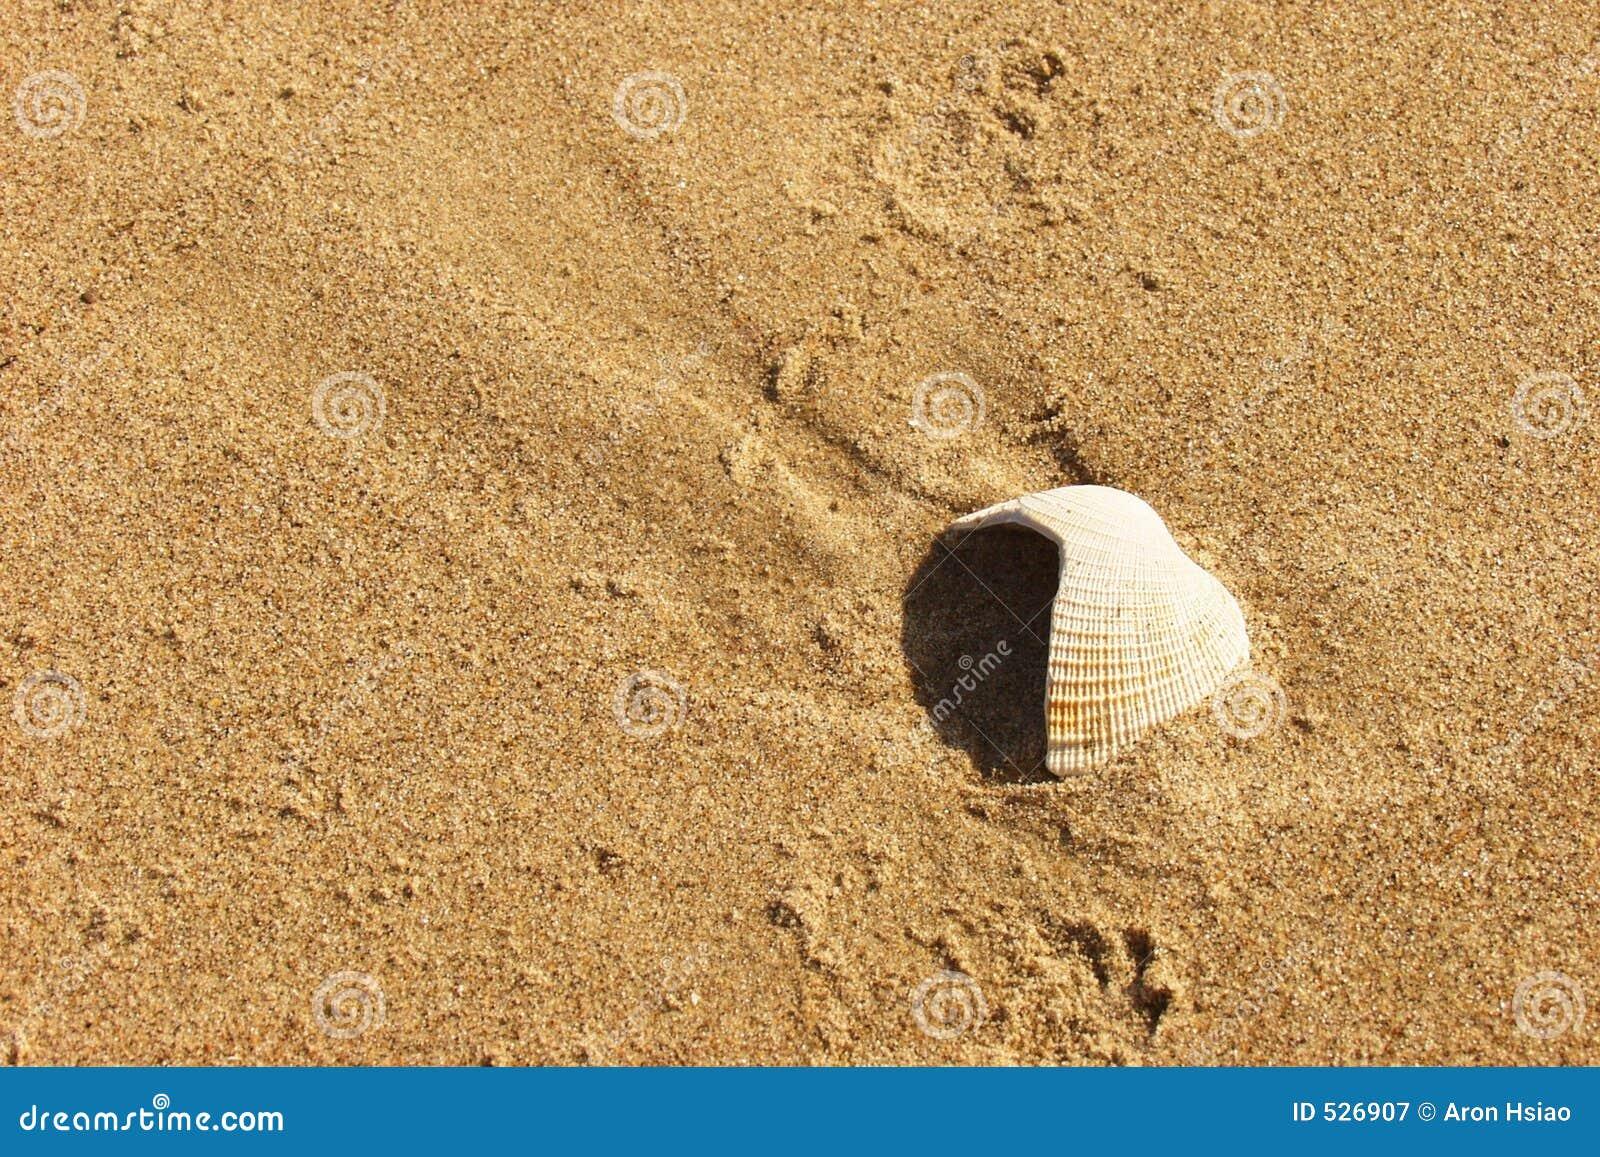 Download 沙子贝壳风化了 库存图片. 图片 包括有 火箭筒, 沙子, 侵蚀, 蛤蜊, 粗糙, 海洋, 热带, 贝壳, 海运 - 526907